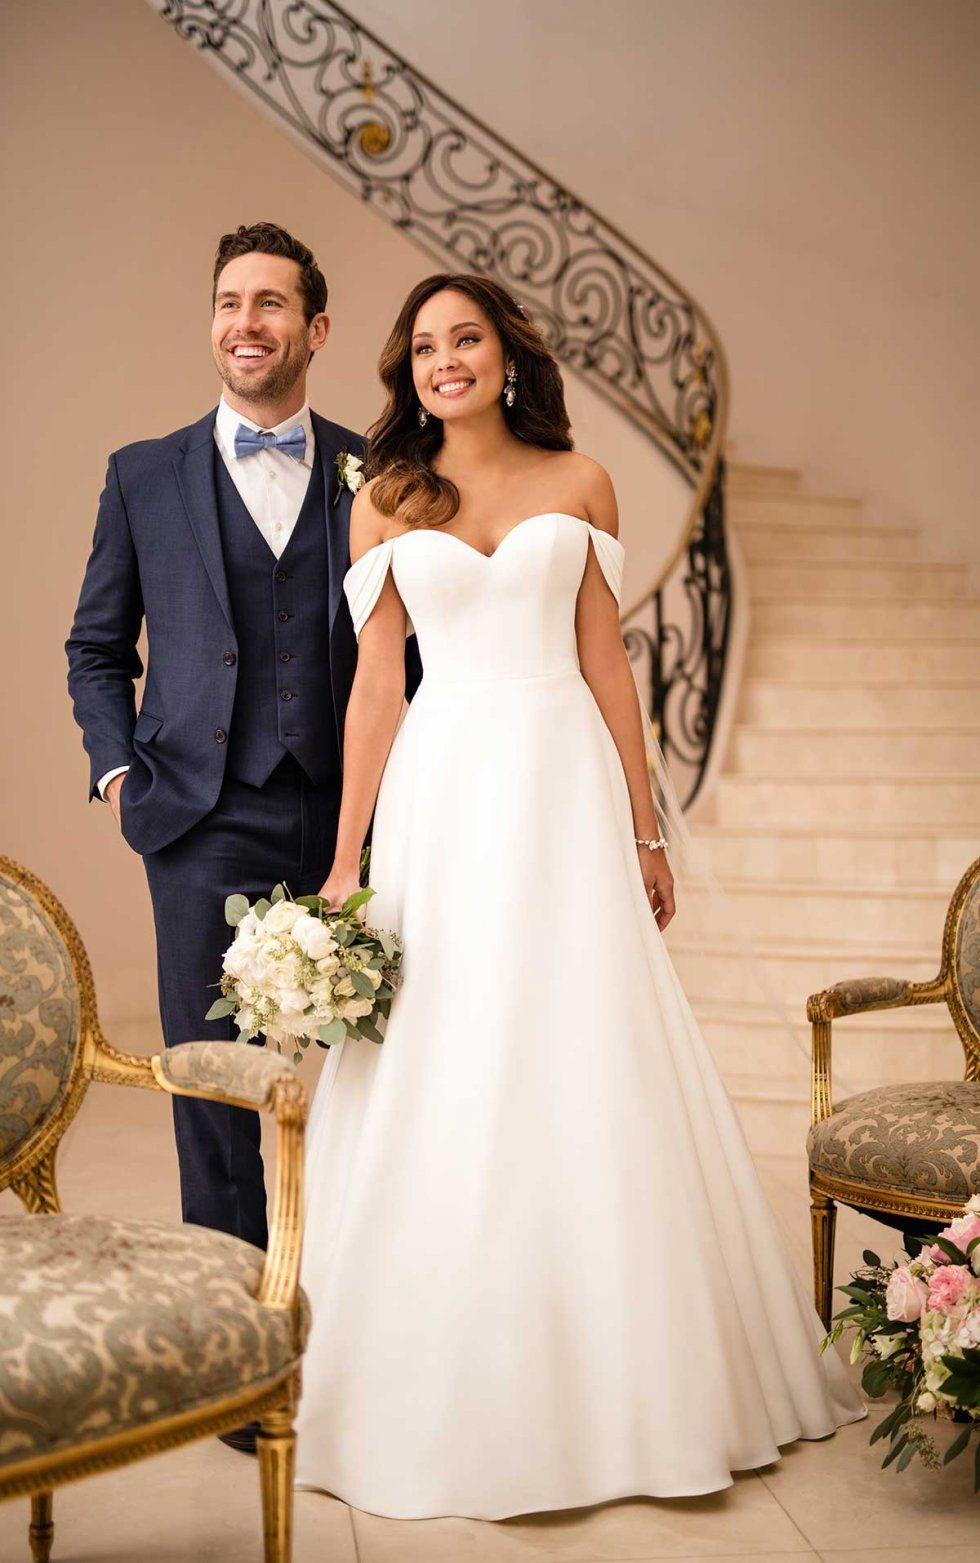 Simple Satin Plus Size Wedding Dress Stella York Wedding Gowns Wedding Dresses Satin Stella York Wedding Dress Wedding Dresses [ 1563 x 980 Pixel ]